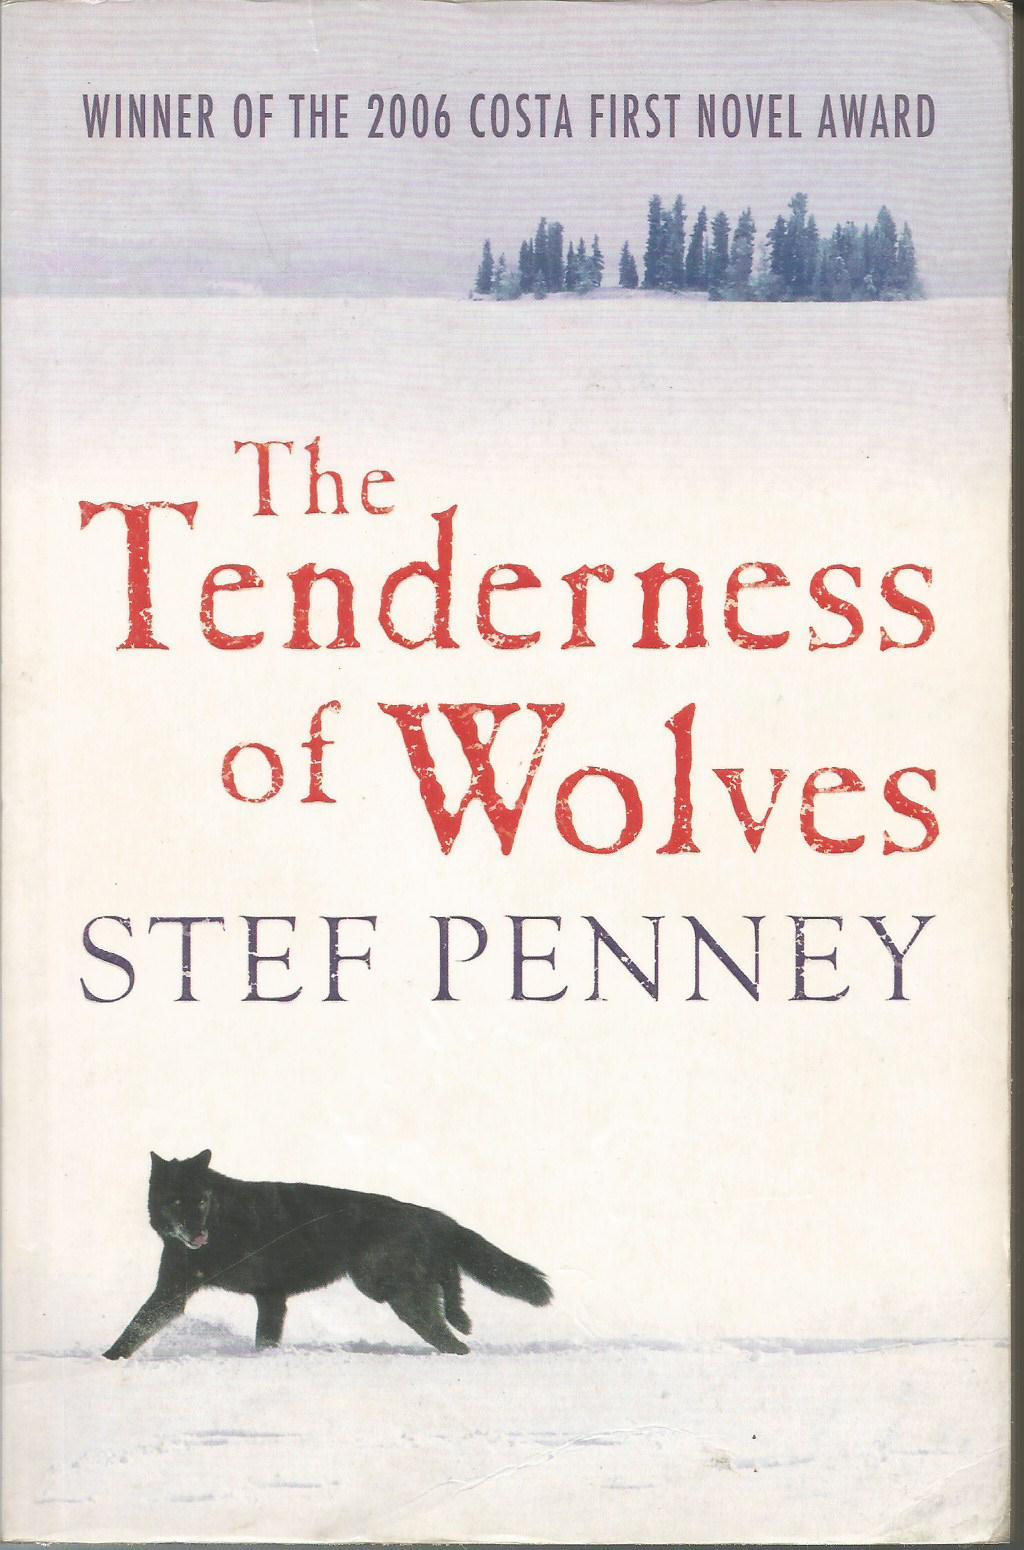 The Tenderness of Wolves: A Novel